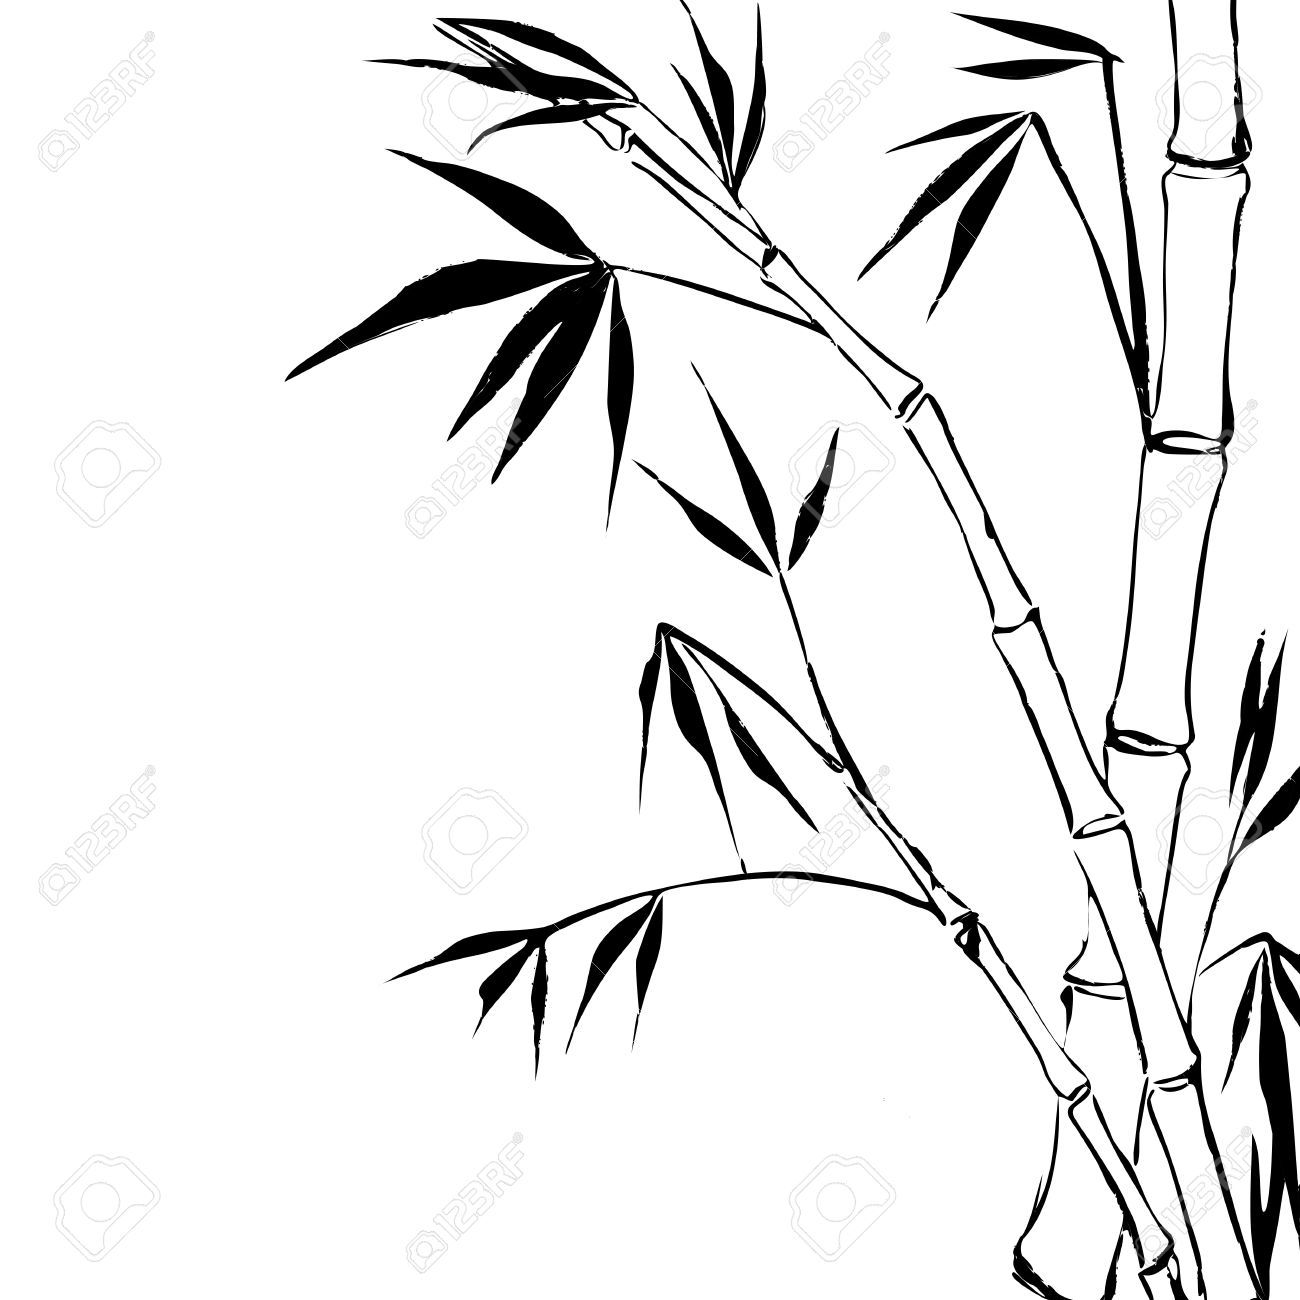 18766059 Bamboo  Stock Vector bamboo white.jpg 1300×1300 ...